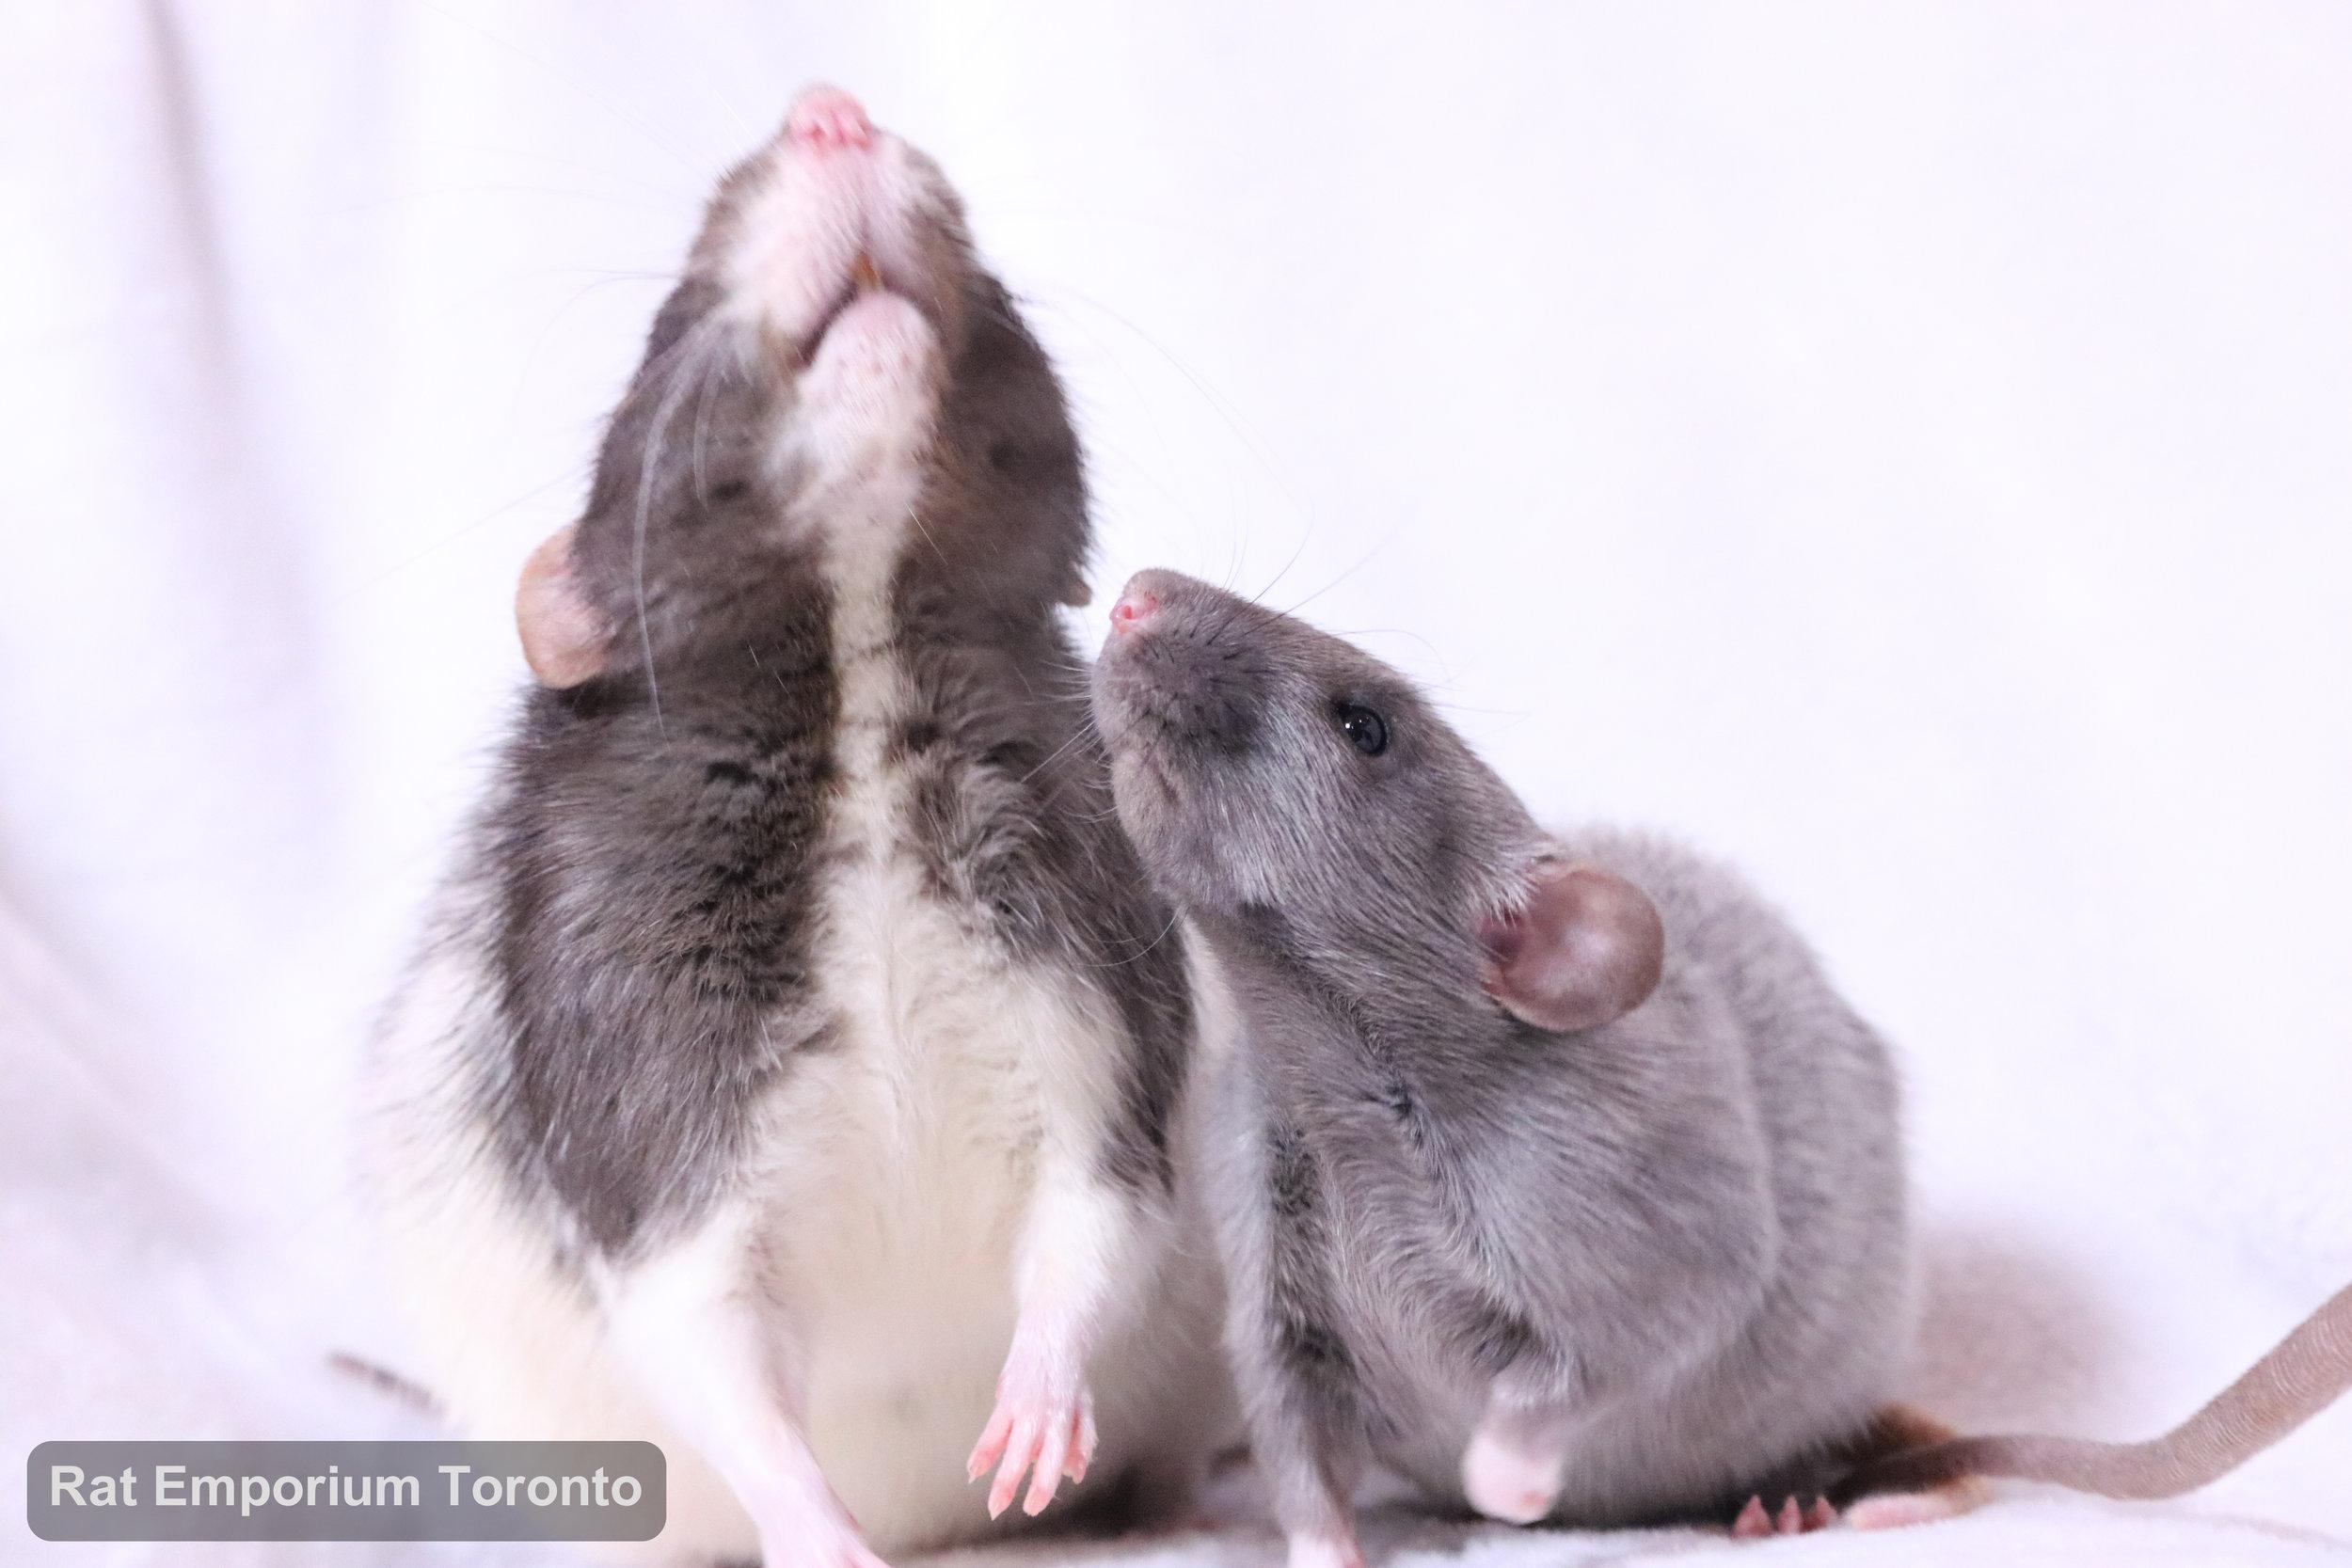 black and white variegated dumbo rat, mink dumbo rat, black silvermane dumbo rat - born and raised at Rat Emporium Toronto - pet rat breeder - adopt pet rats Toronto